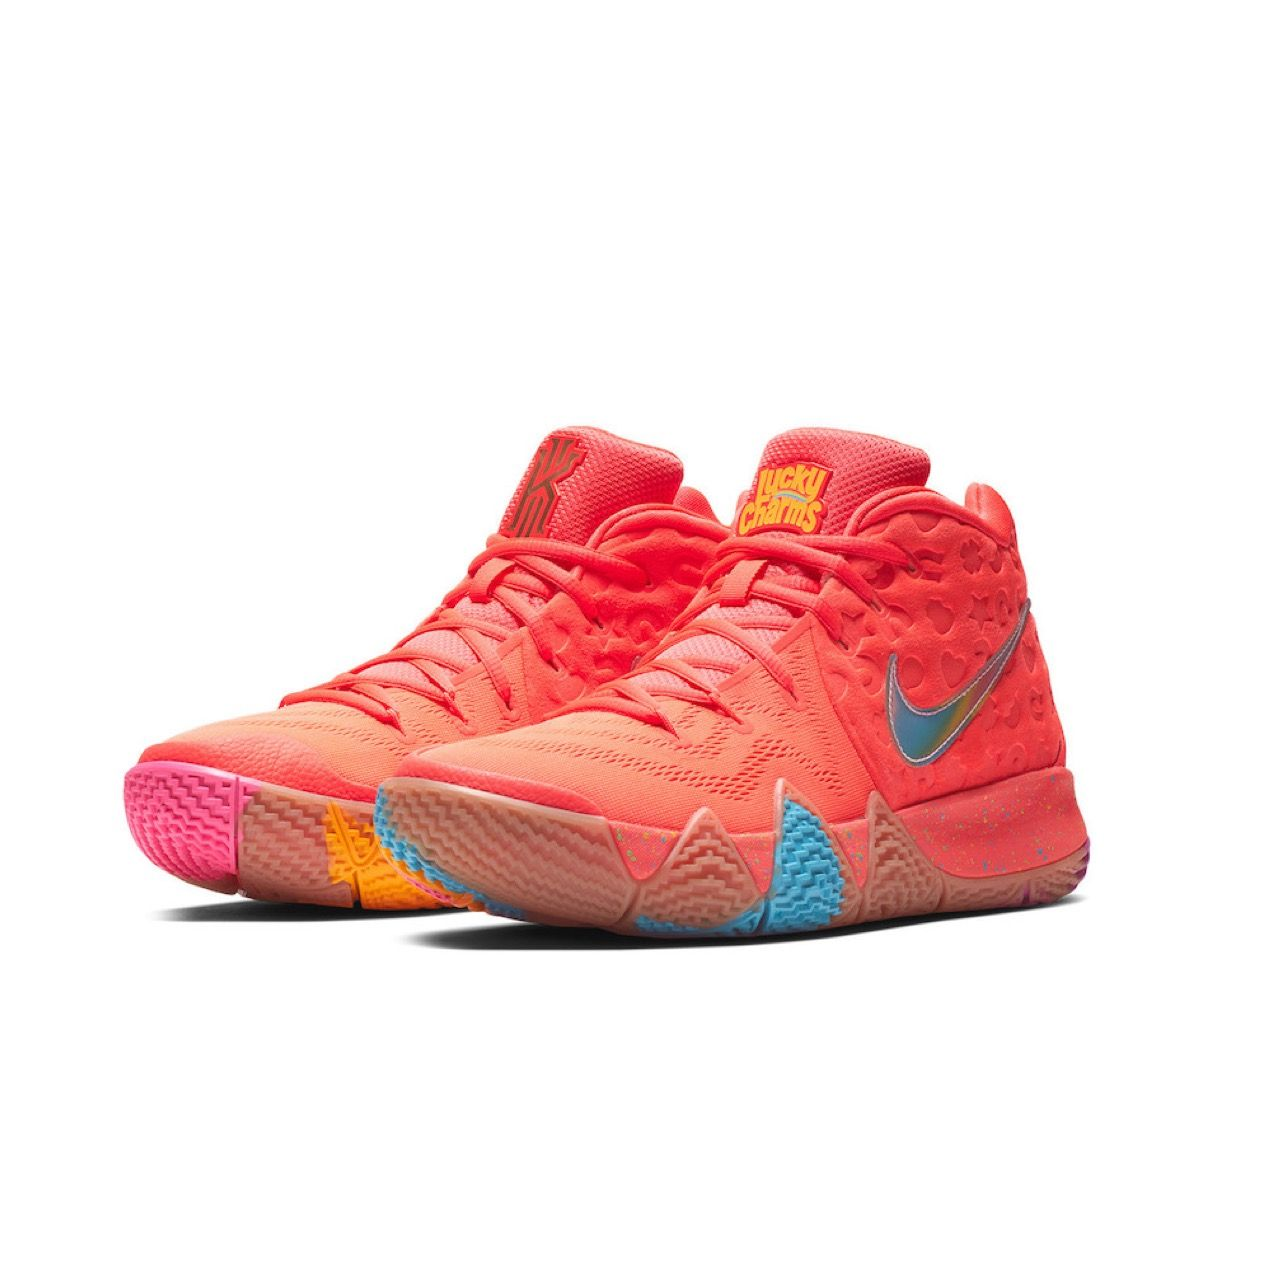 Nike Kyrie 4 Lucky Charms   Kyrie